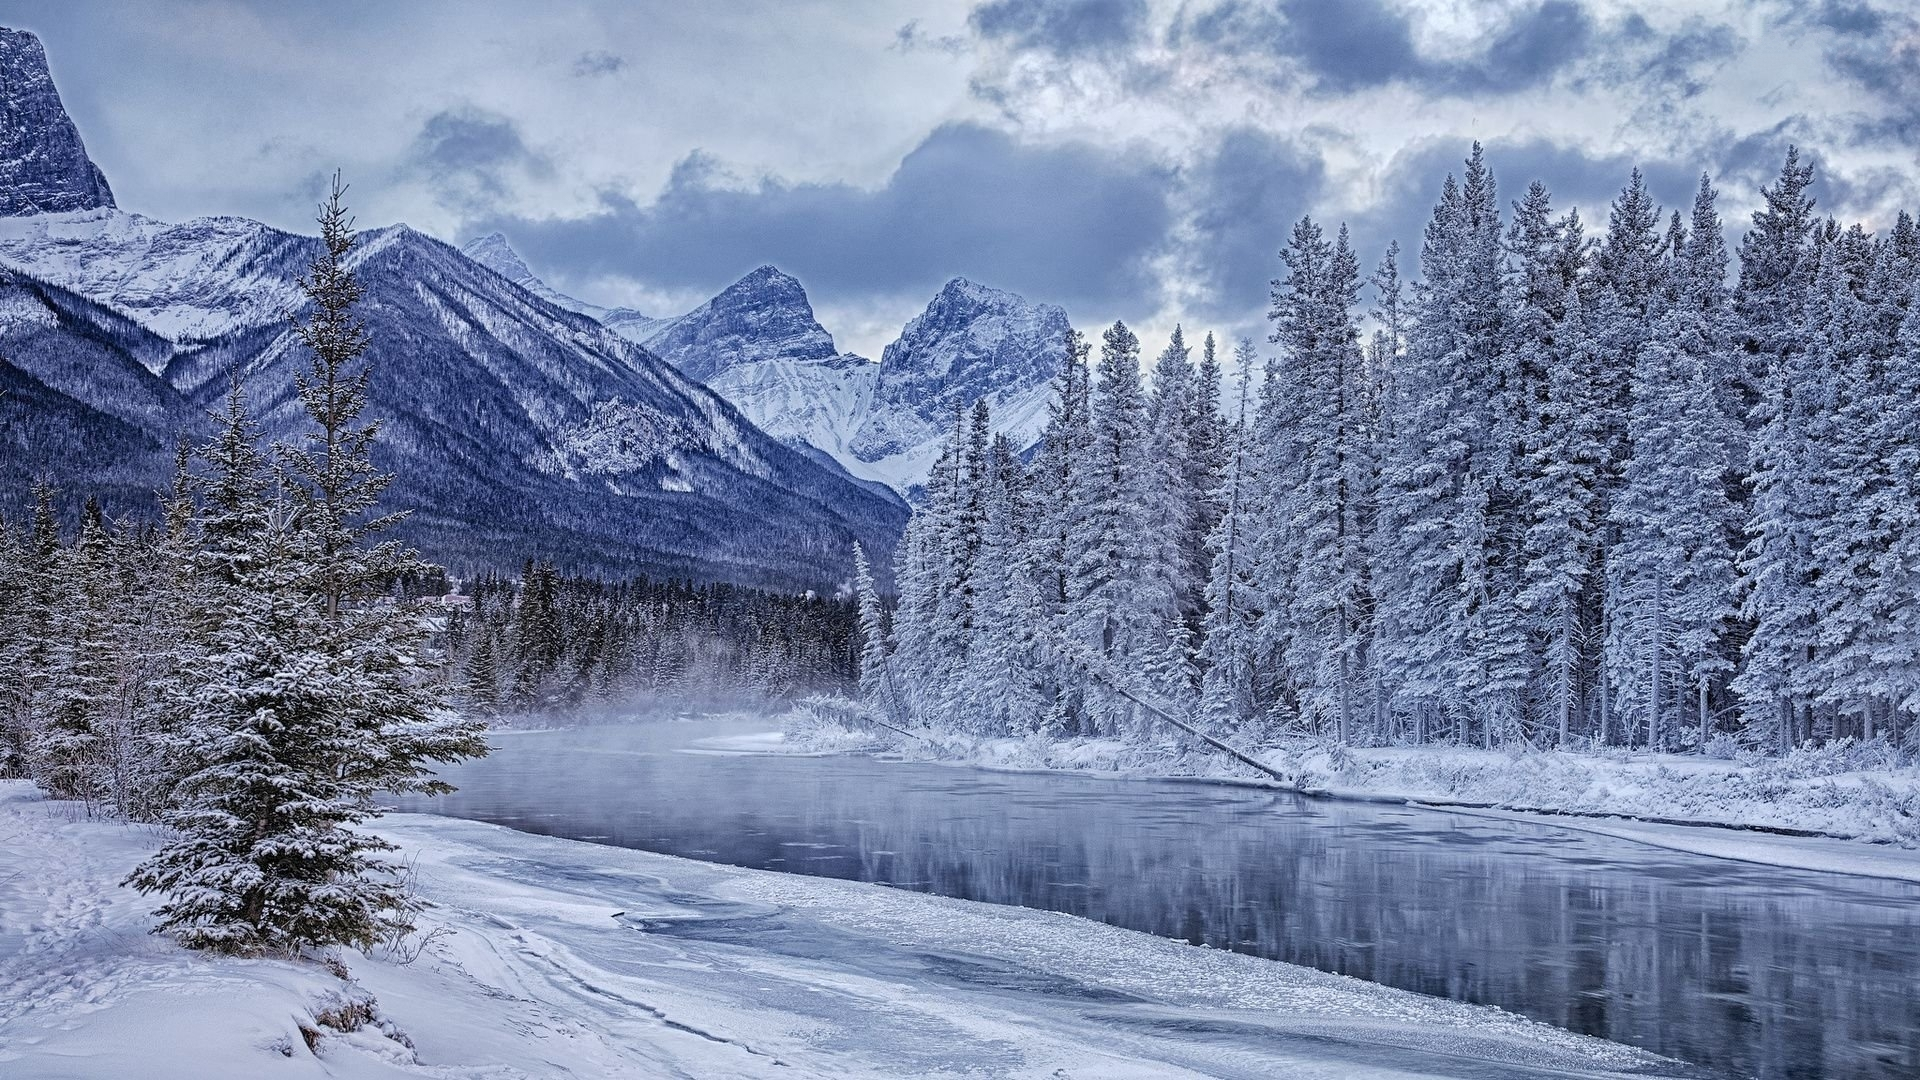 snow river winter landscape wallpaper full hd. - media file